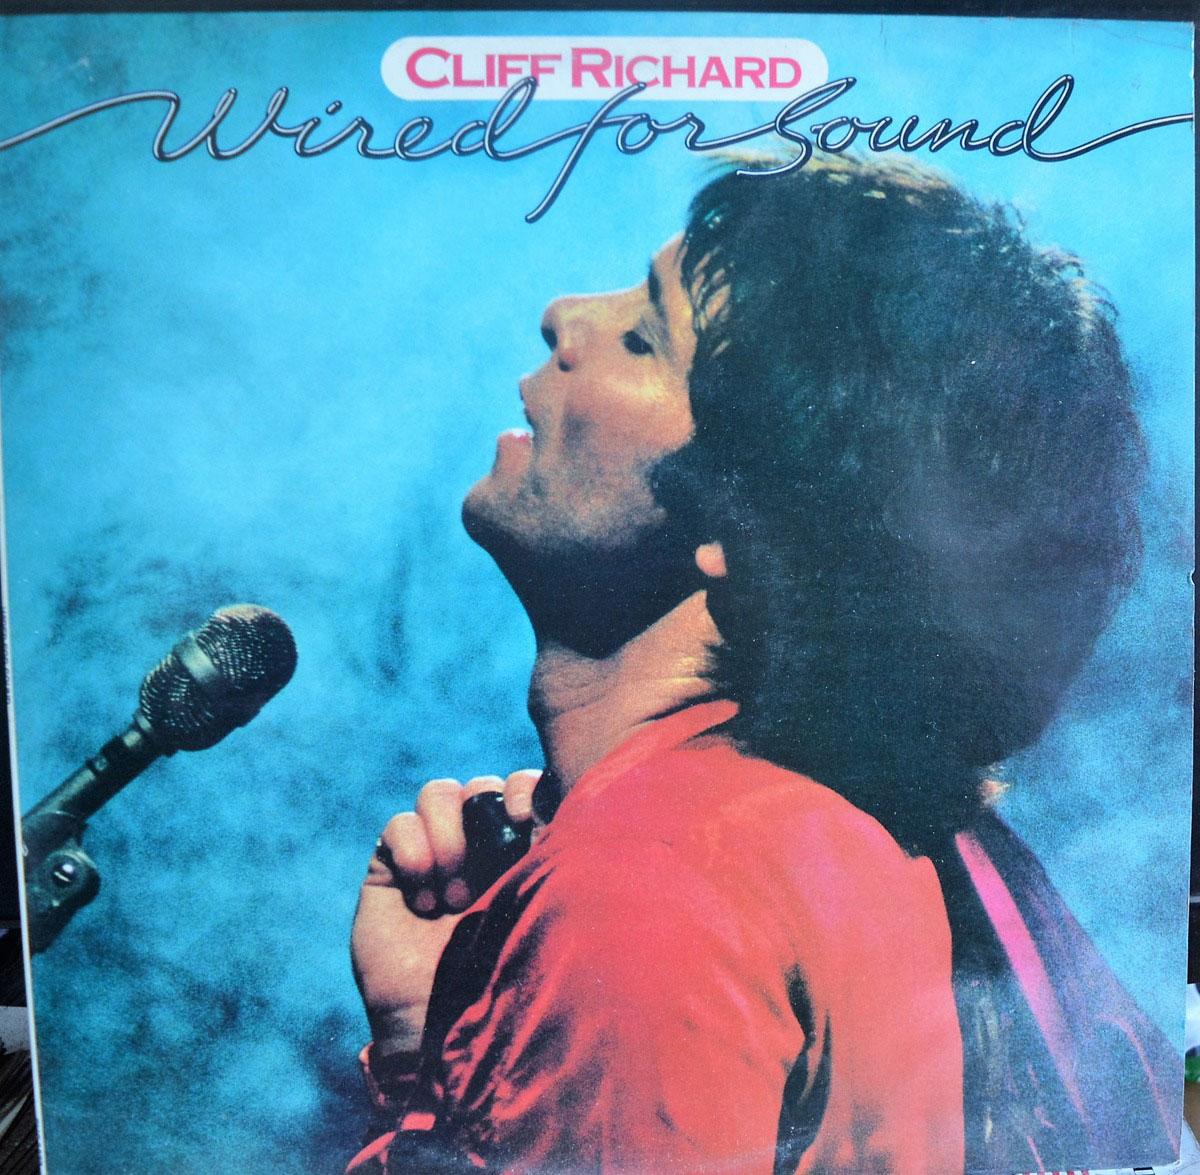 Cliff Richard - Wired For Sound Lyrics | MetroLyrics